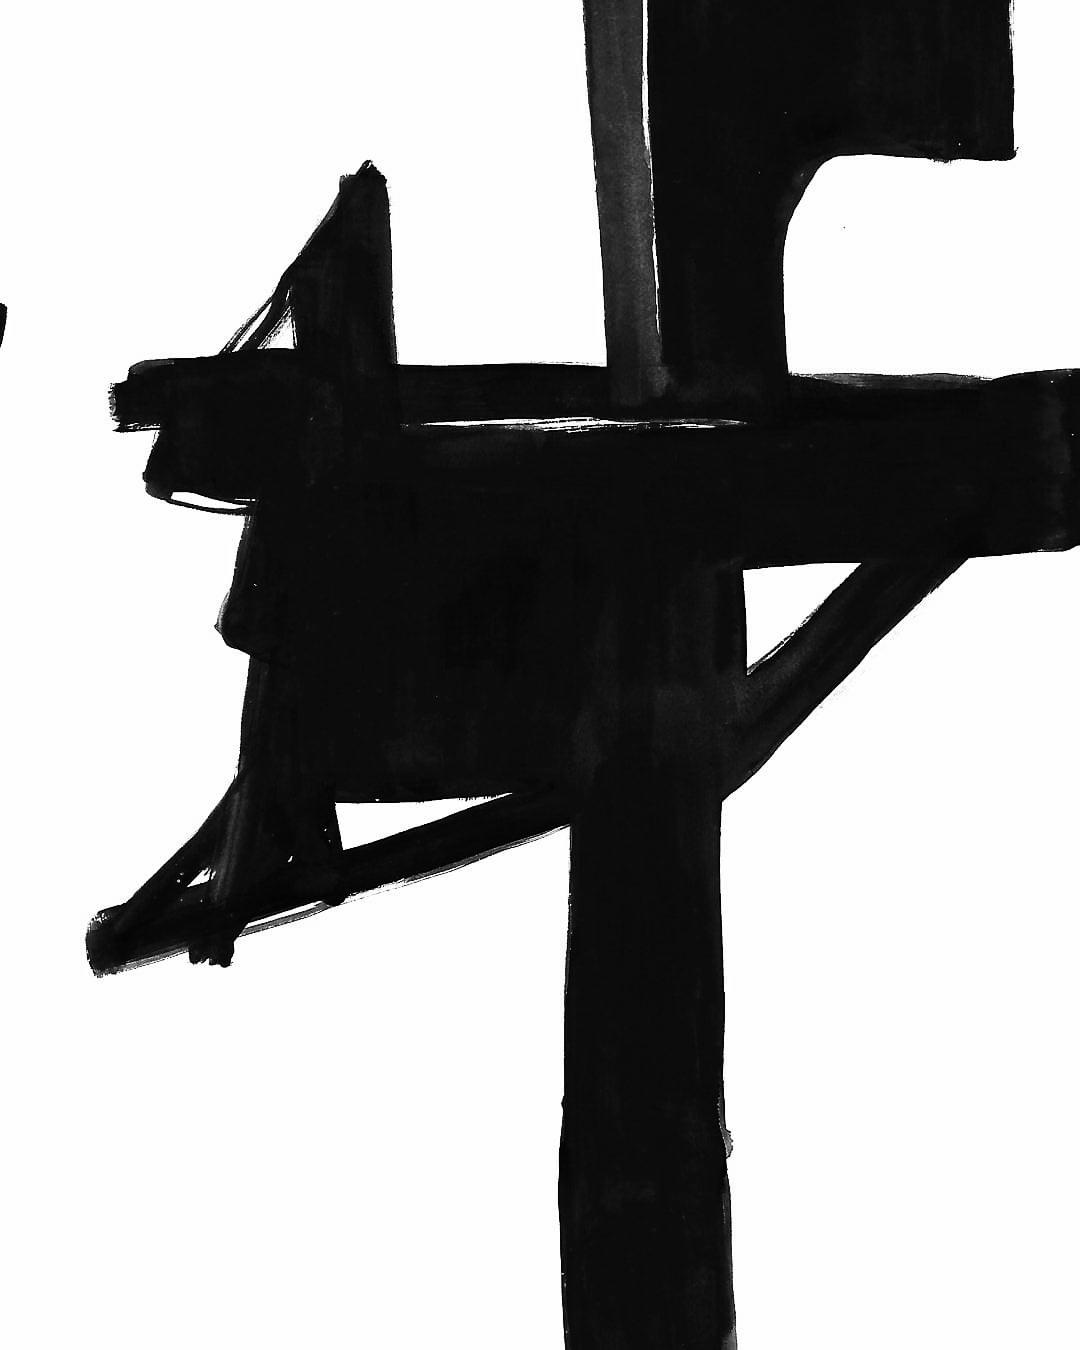 D'APRES FRANZ KLINE UNTITLED 02 2017